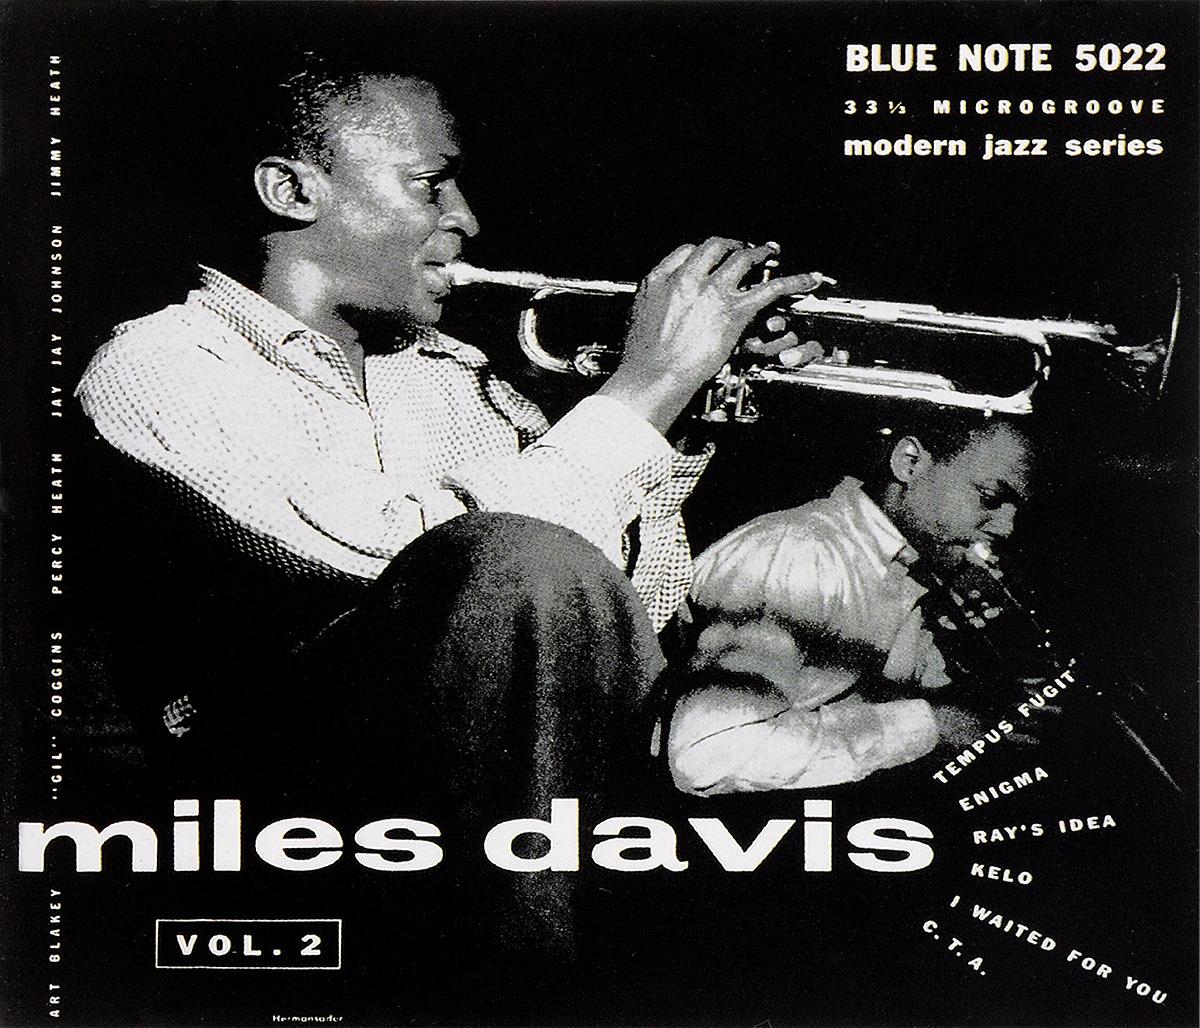 Майлз Дэвис,Джей Джонсон,Джимми Хит,Гил Коггинс,Перси Хит,Арт Блэйки Miles Davis. Volume Two nexus confessions volume two